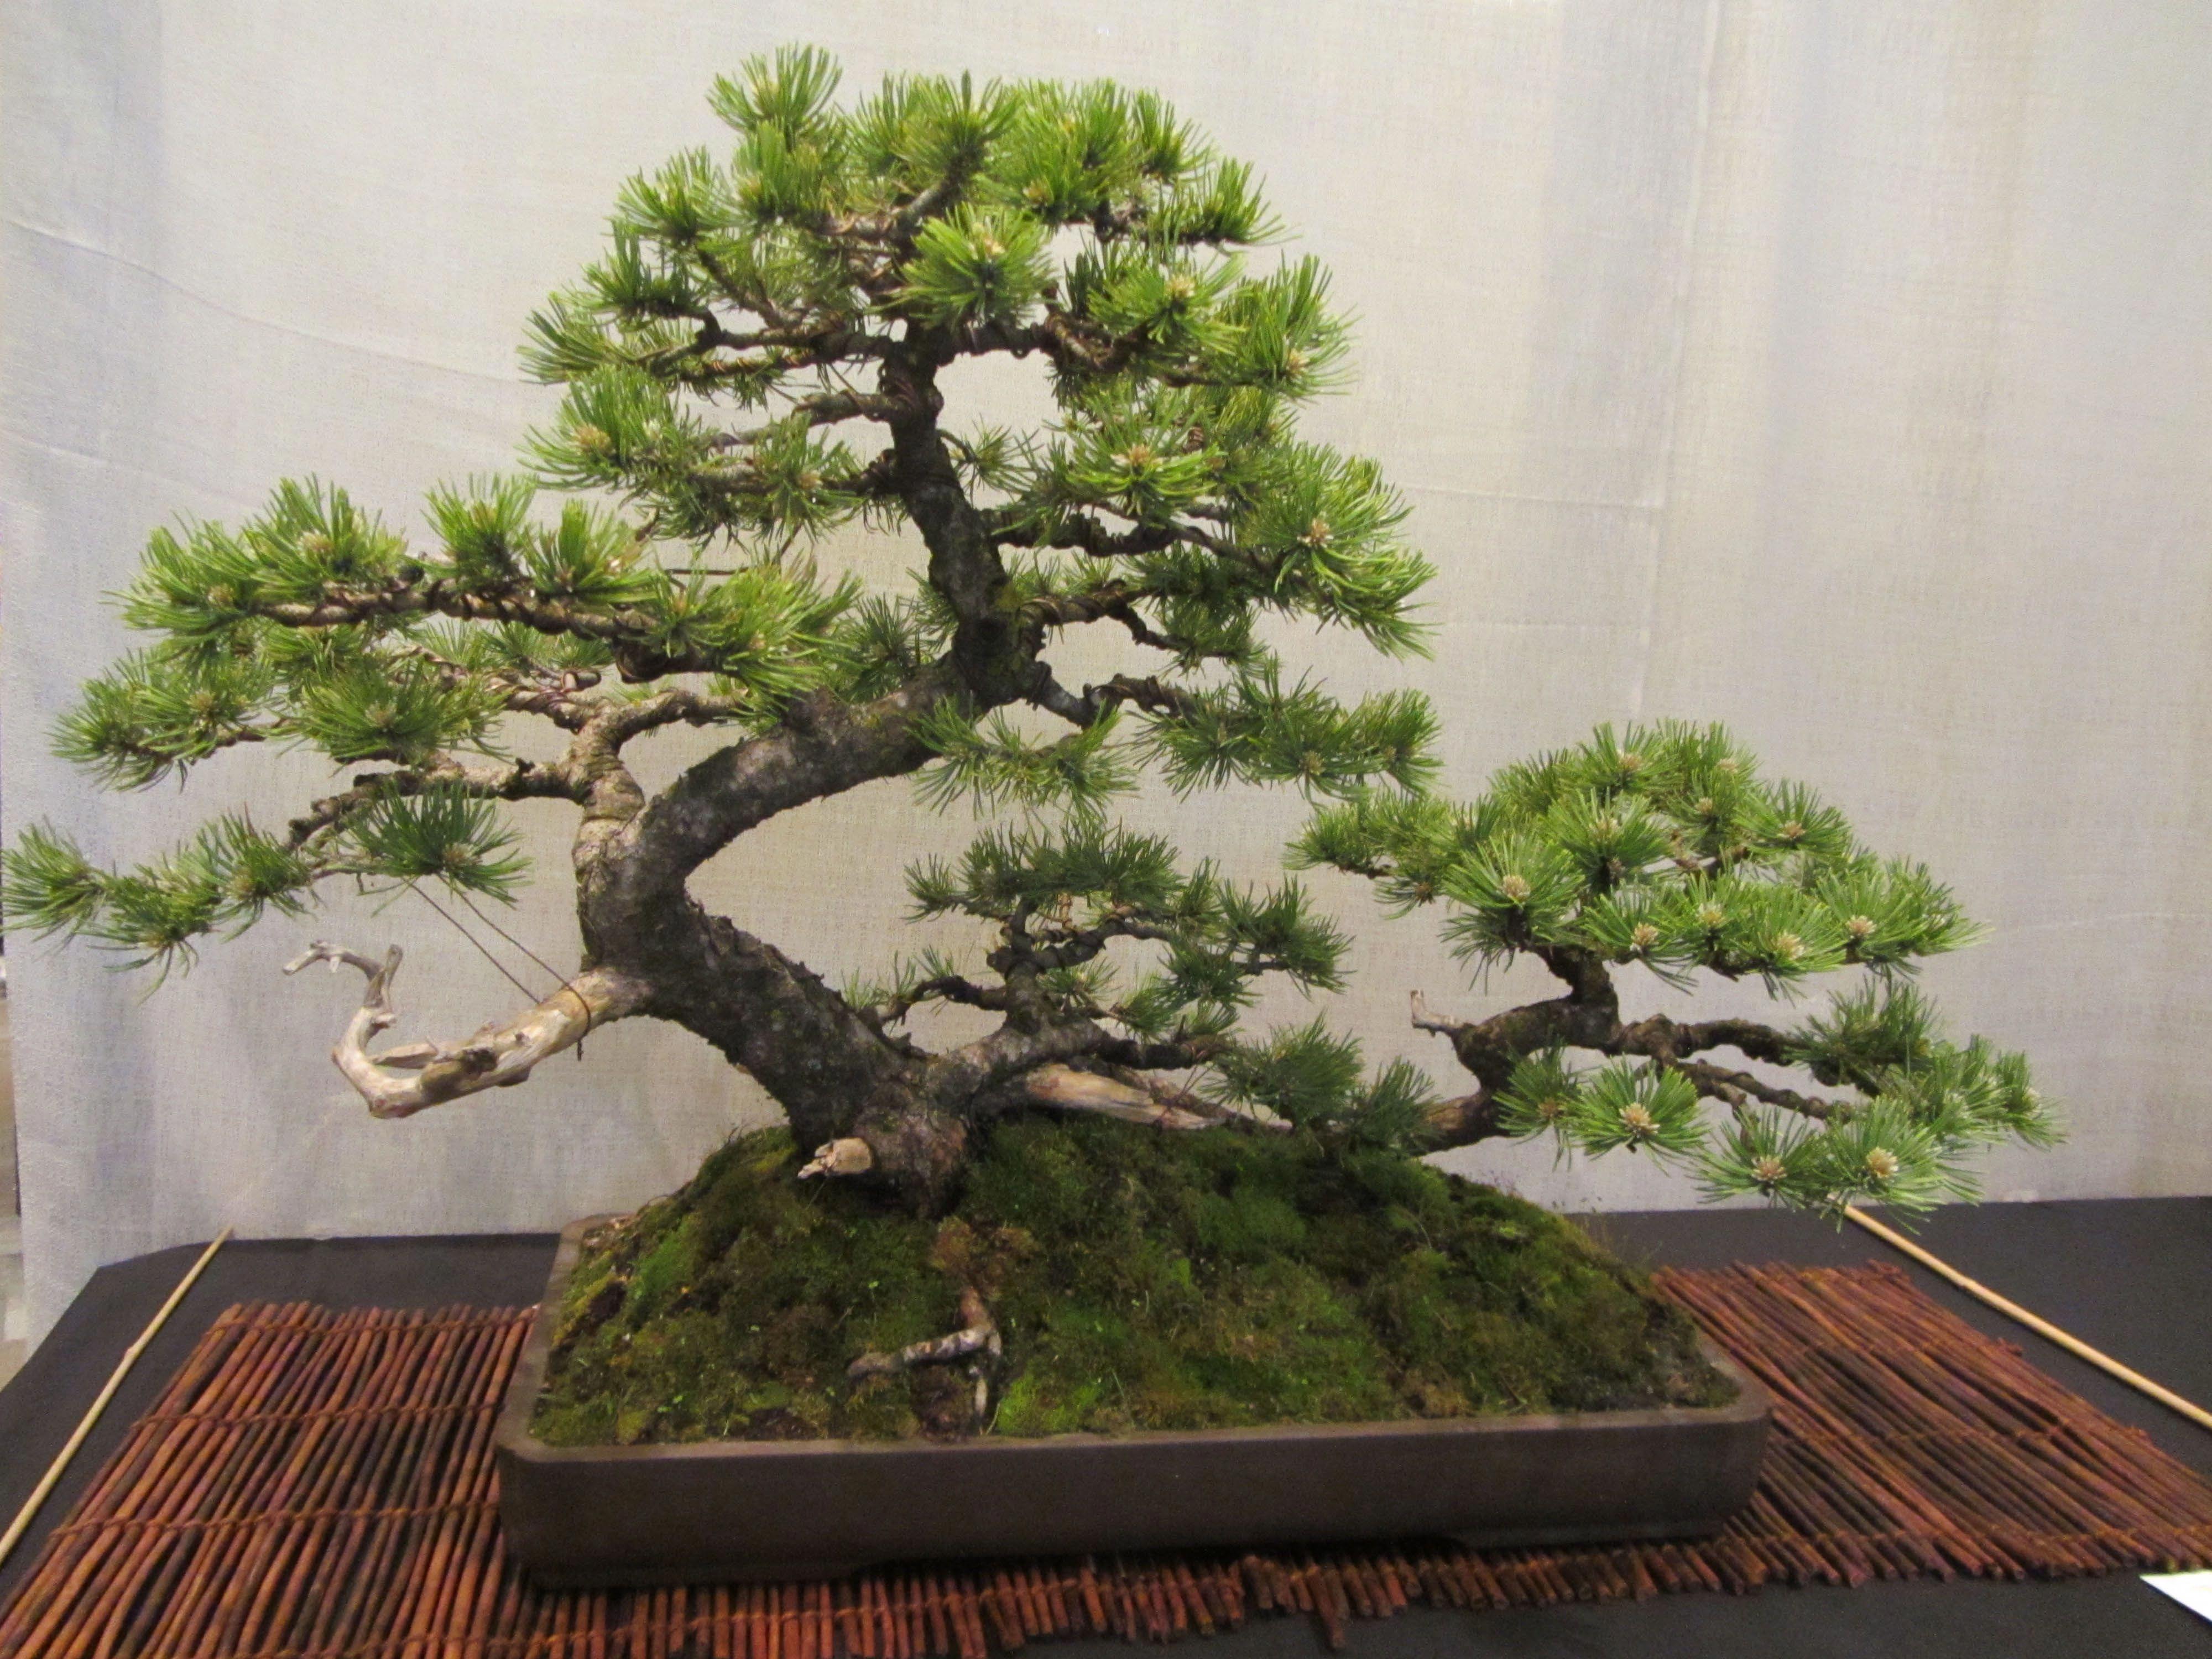 Types Of Bonsai Trees Bonsai Tree Bonsai Forest Pine Bonsai